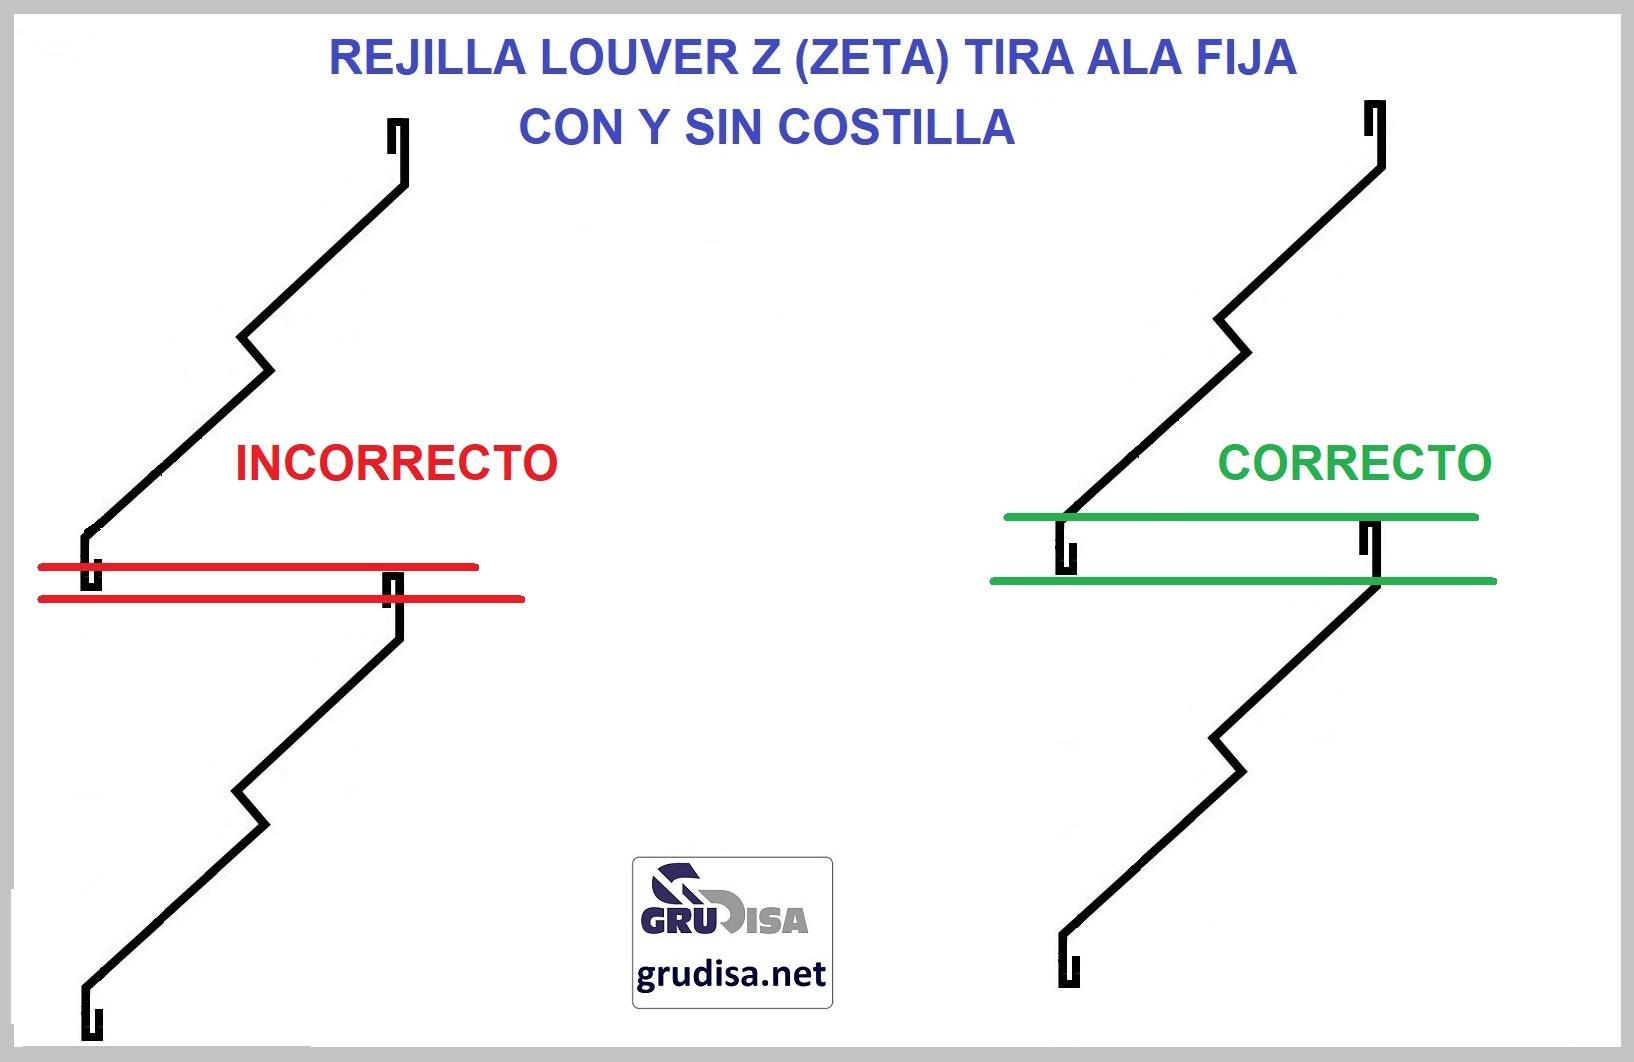 REJILLA LOUVER (TIRA) Z